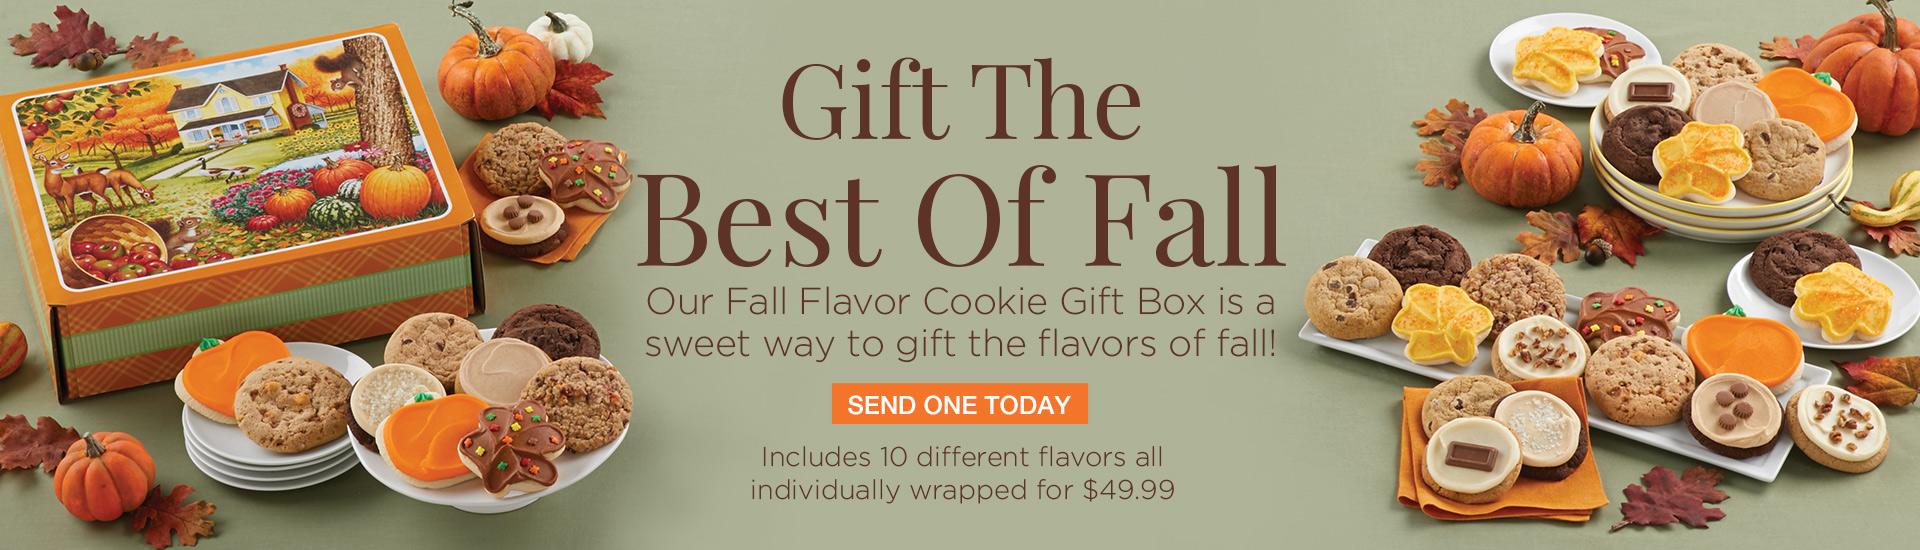 Fall Flavor Cookie Box